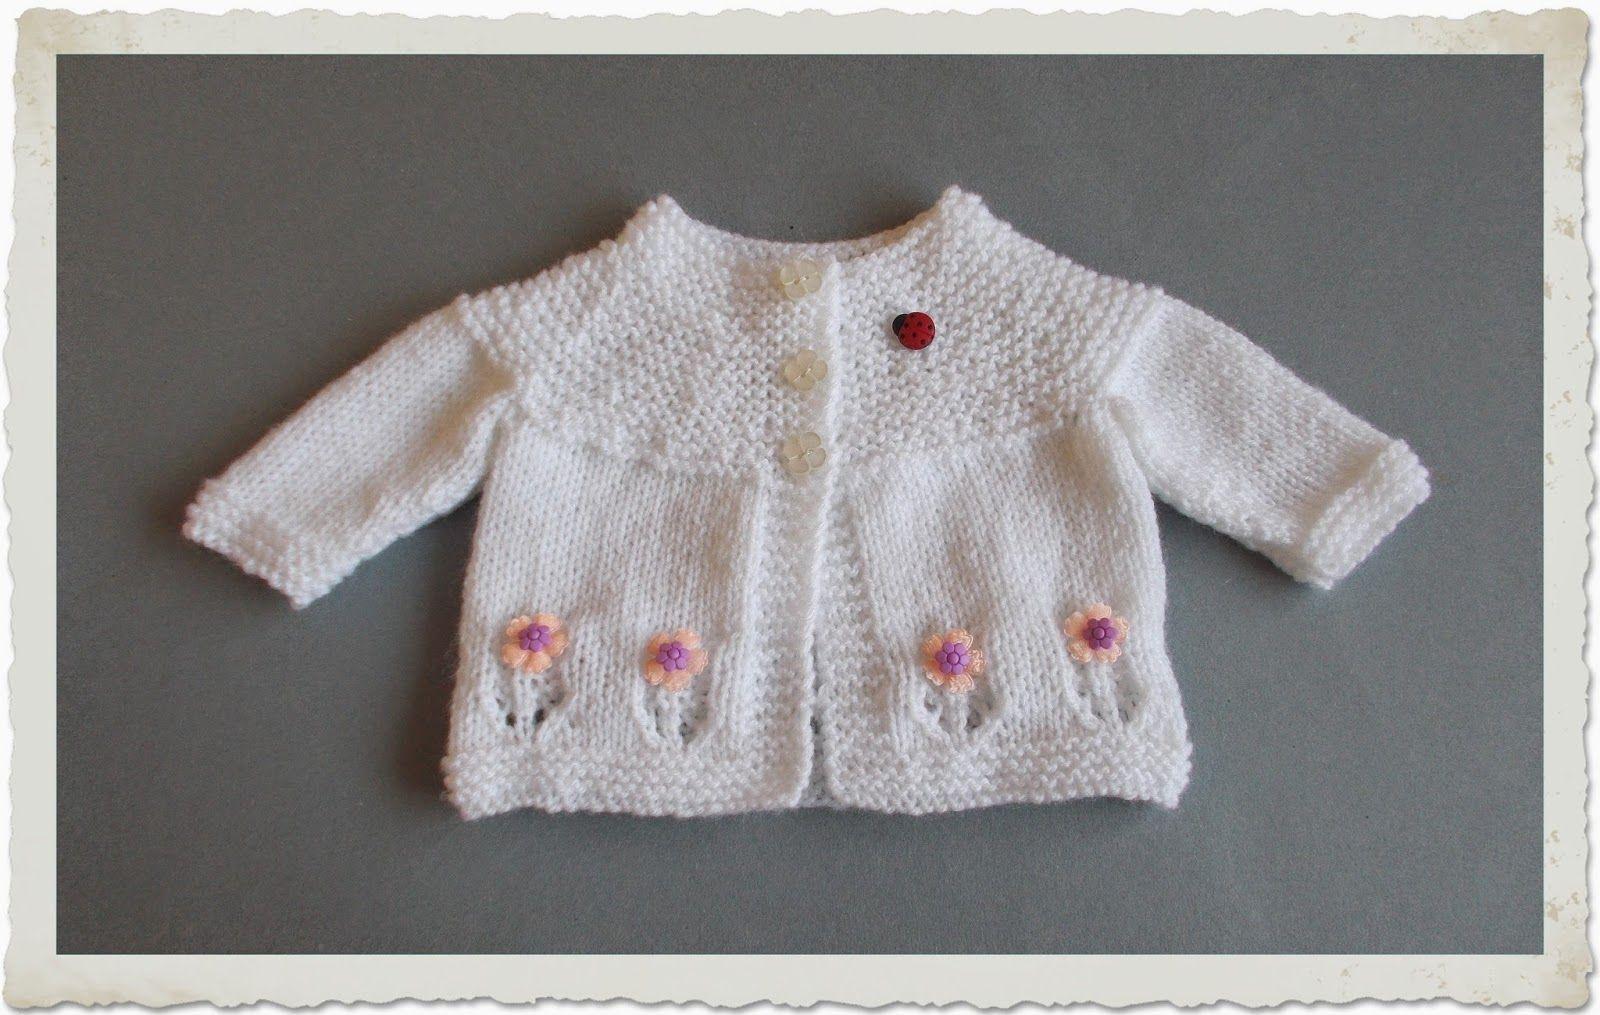 Knitting Patterns for Babies LoveKnitting 3062209 - ginkgobilobahelp ...